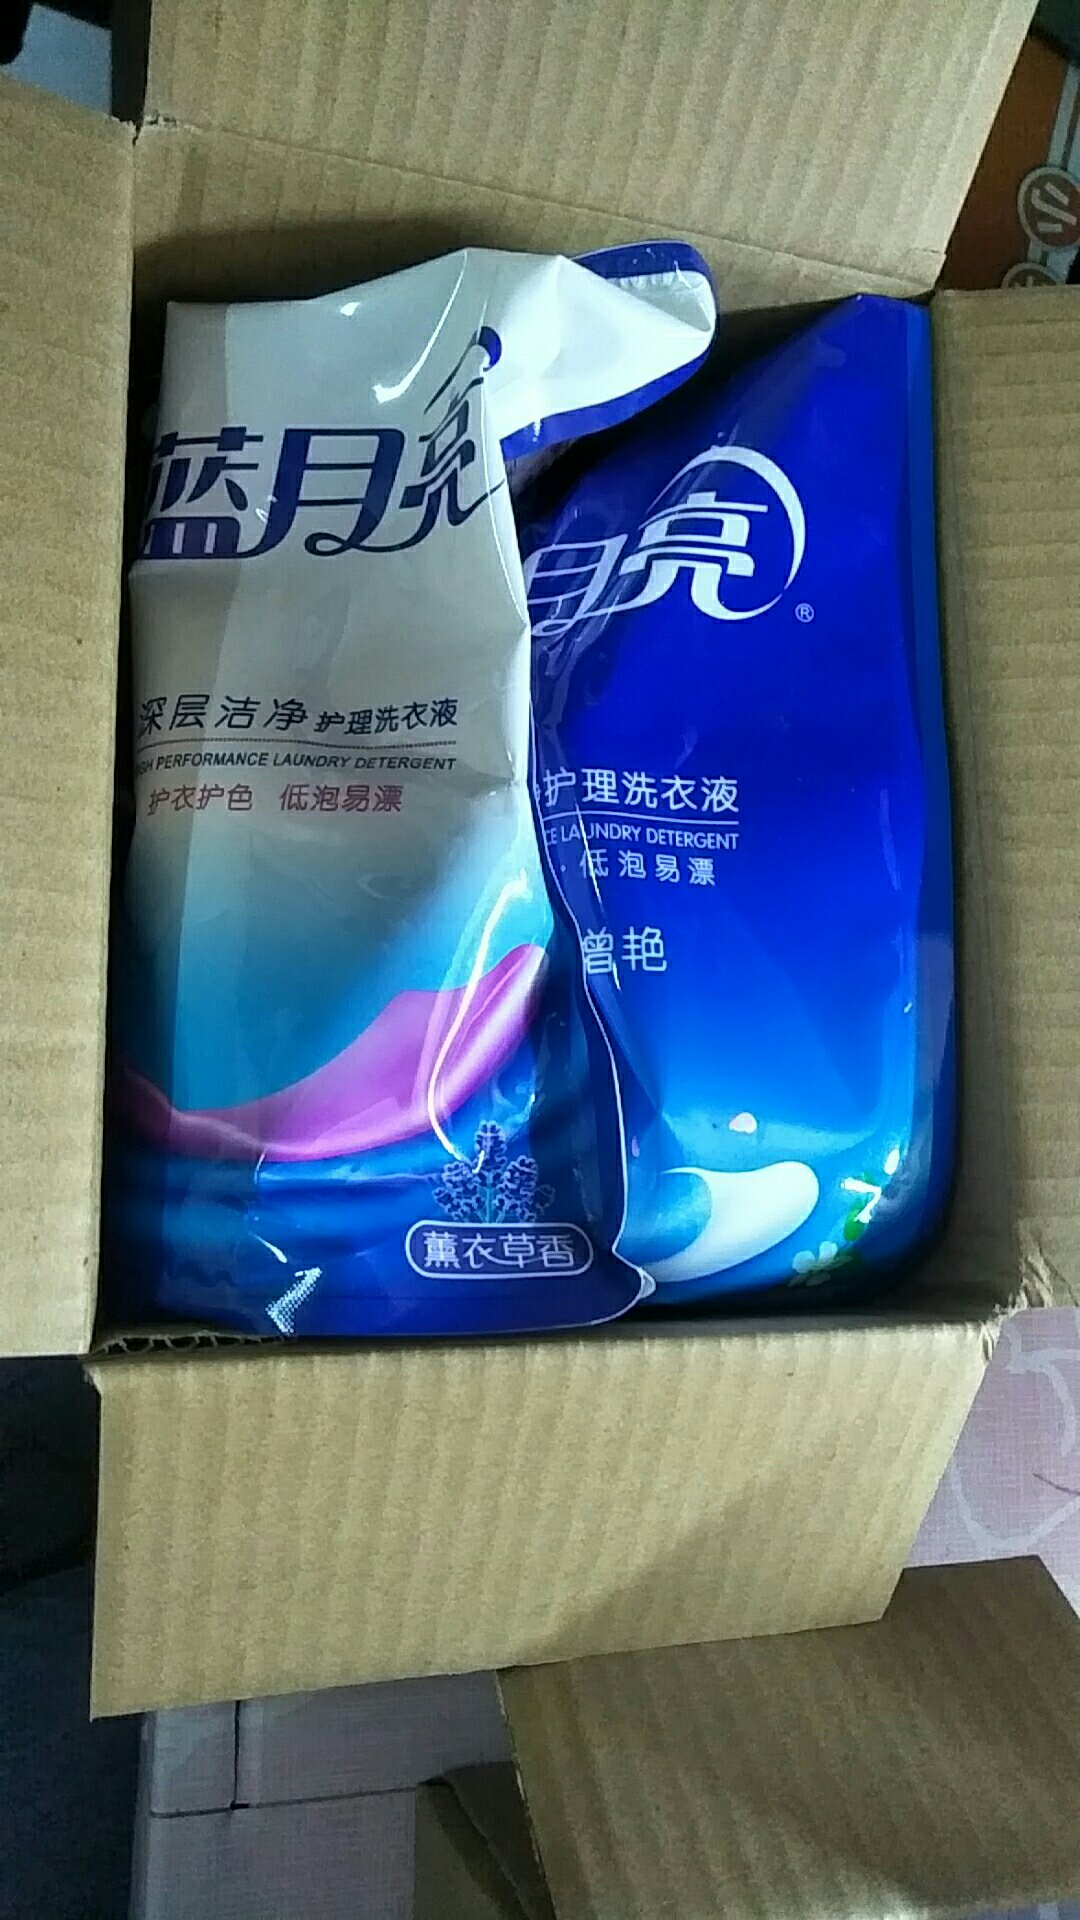 prada online shop 00965770 cheaponsale